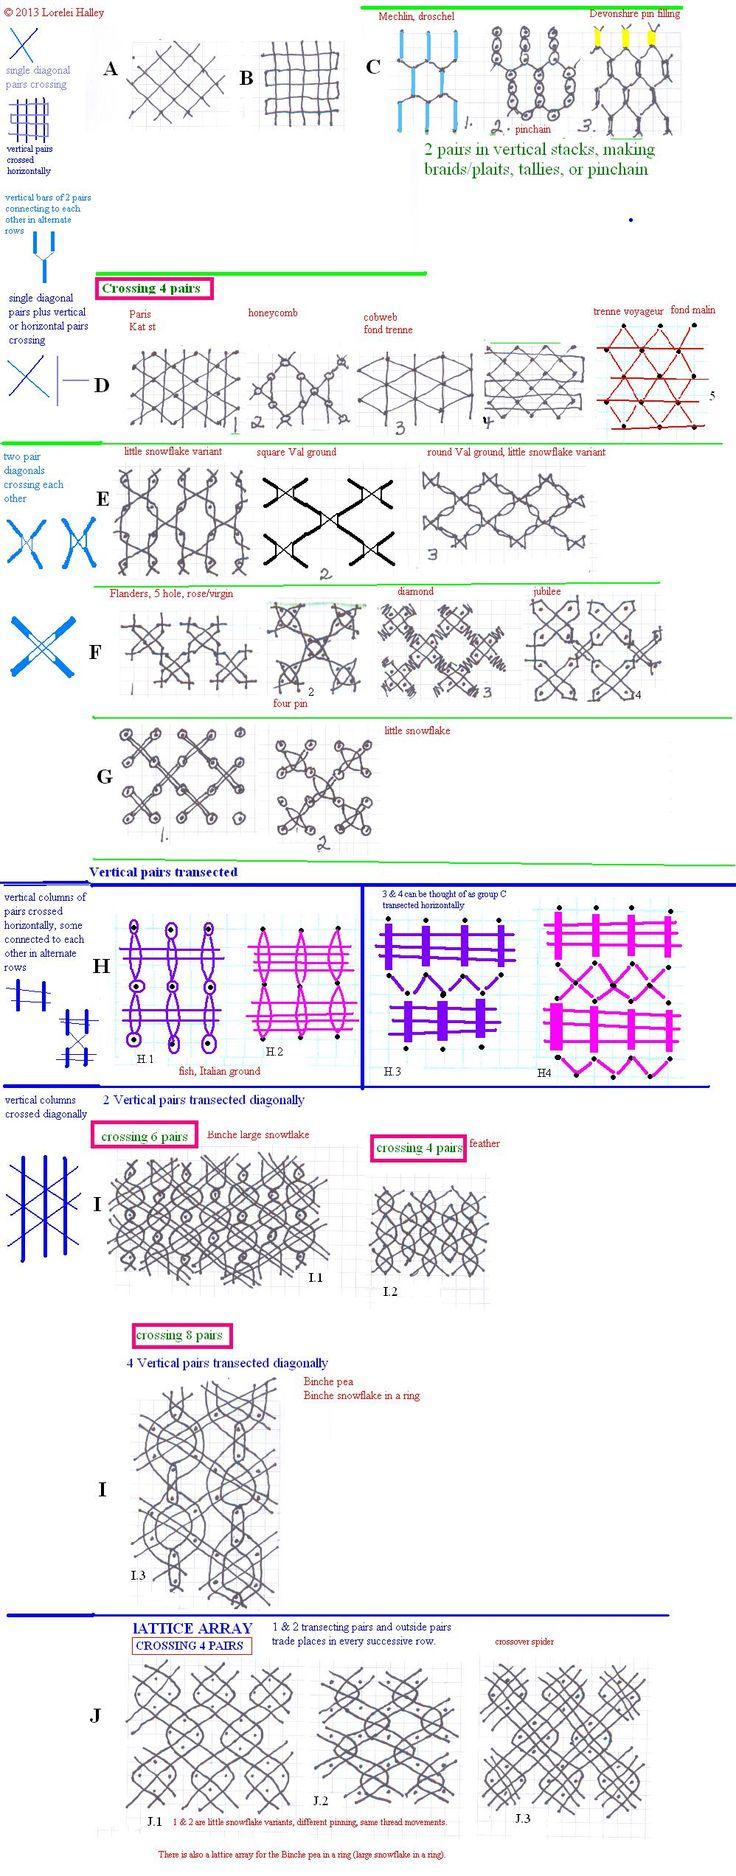 bobbin lace grounds analysis, by Lorelei Halley= lynxlacelady